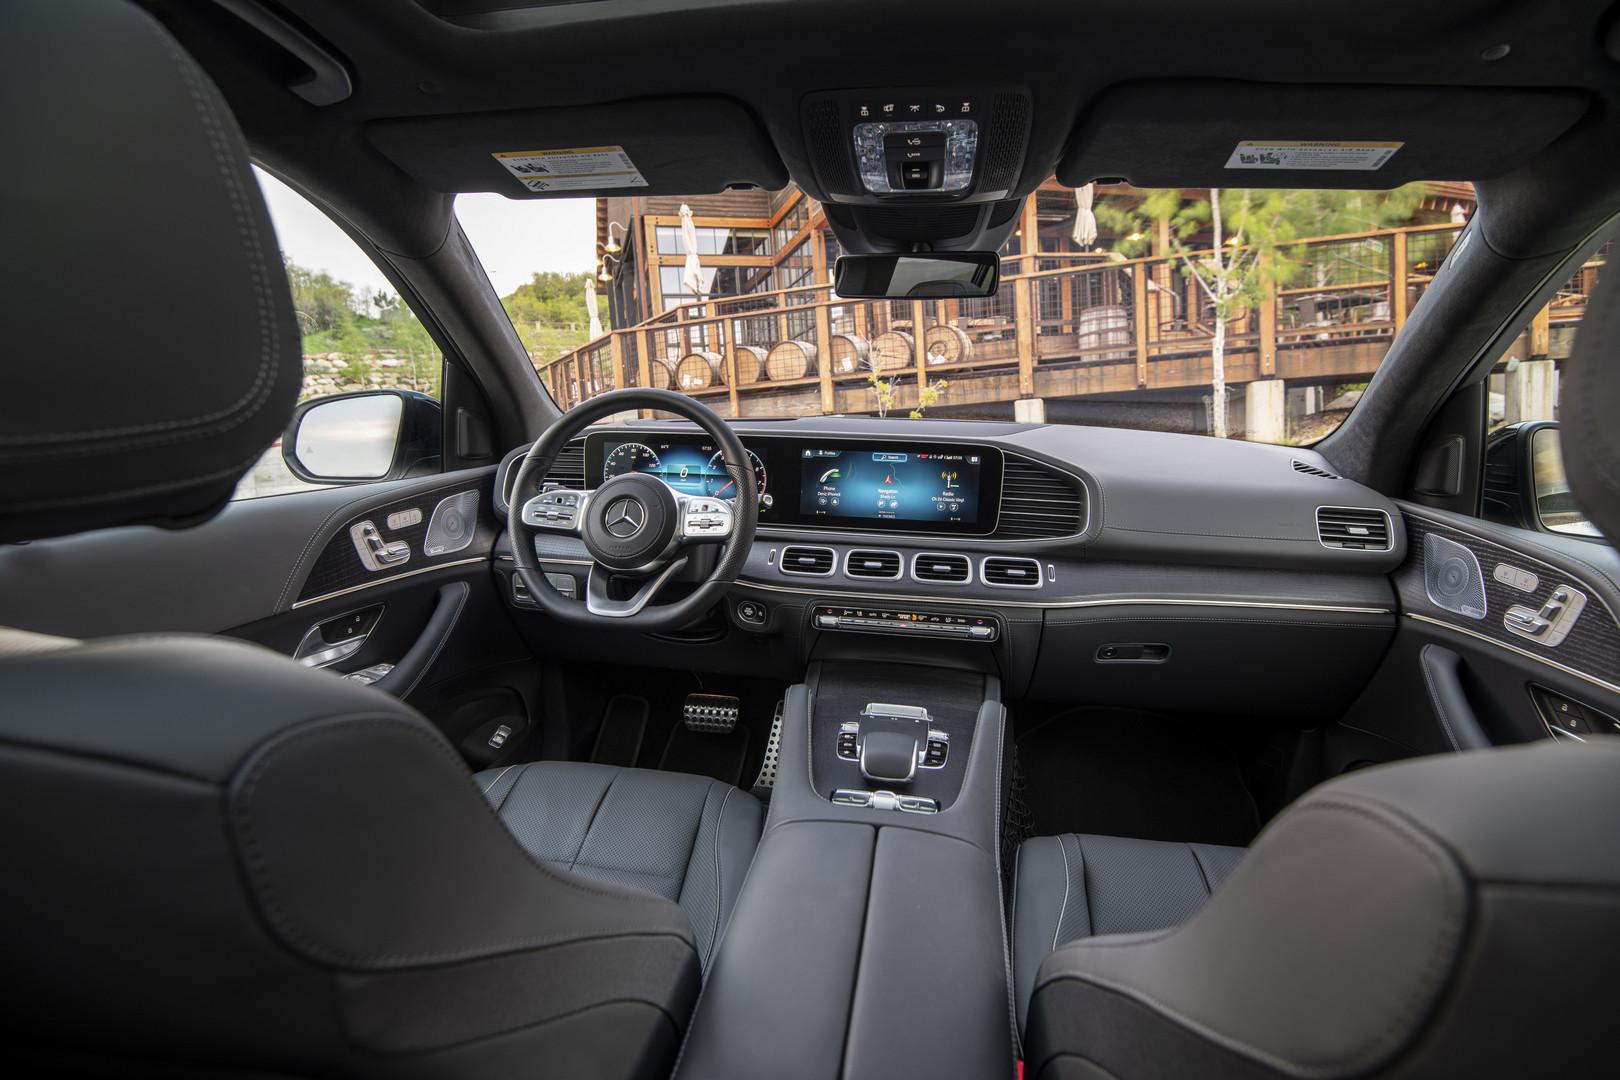 Mercedes-Benz GLS 580 Interior